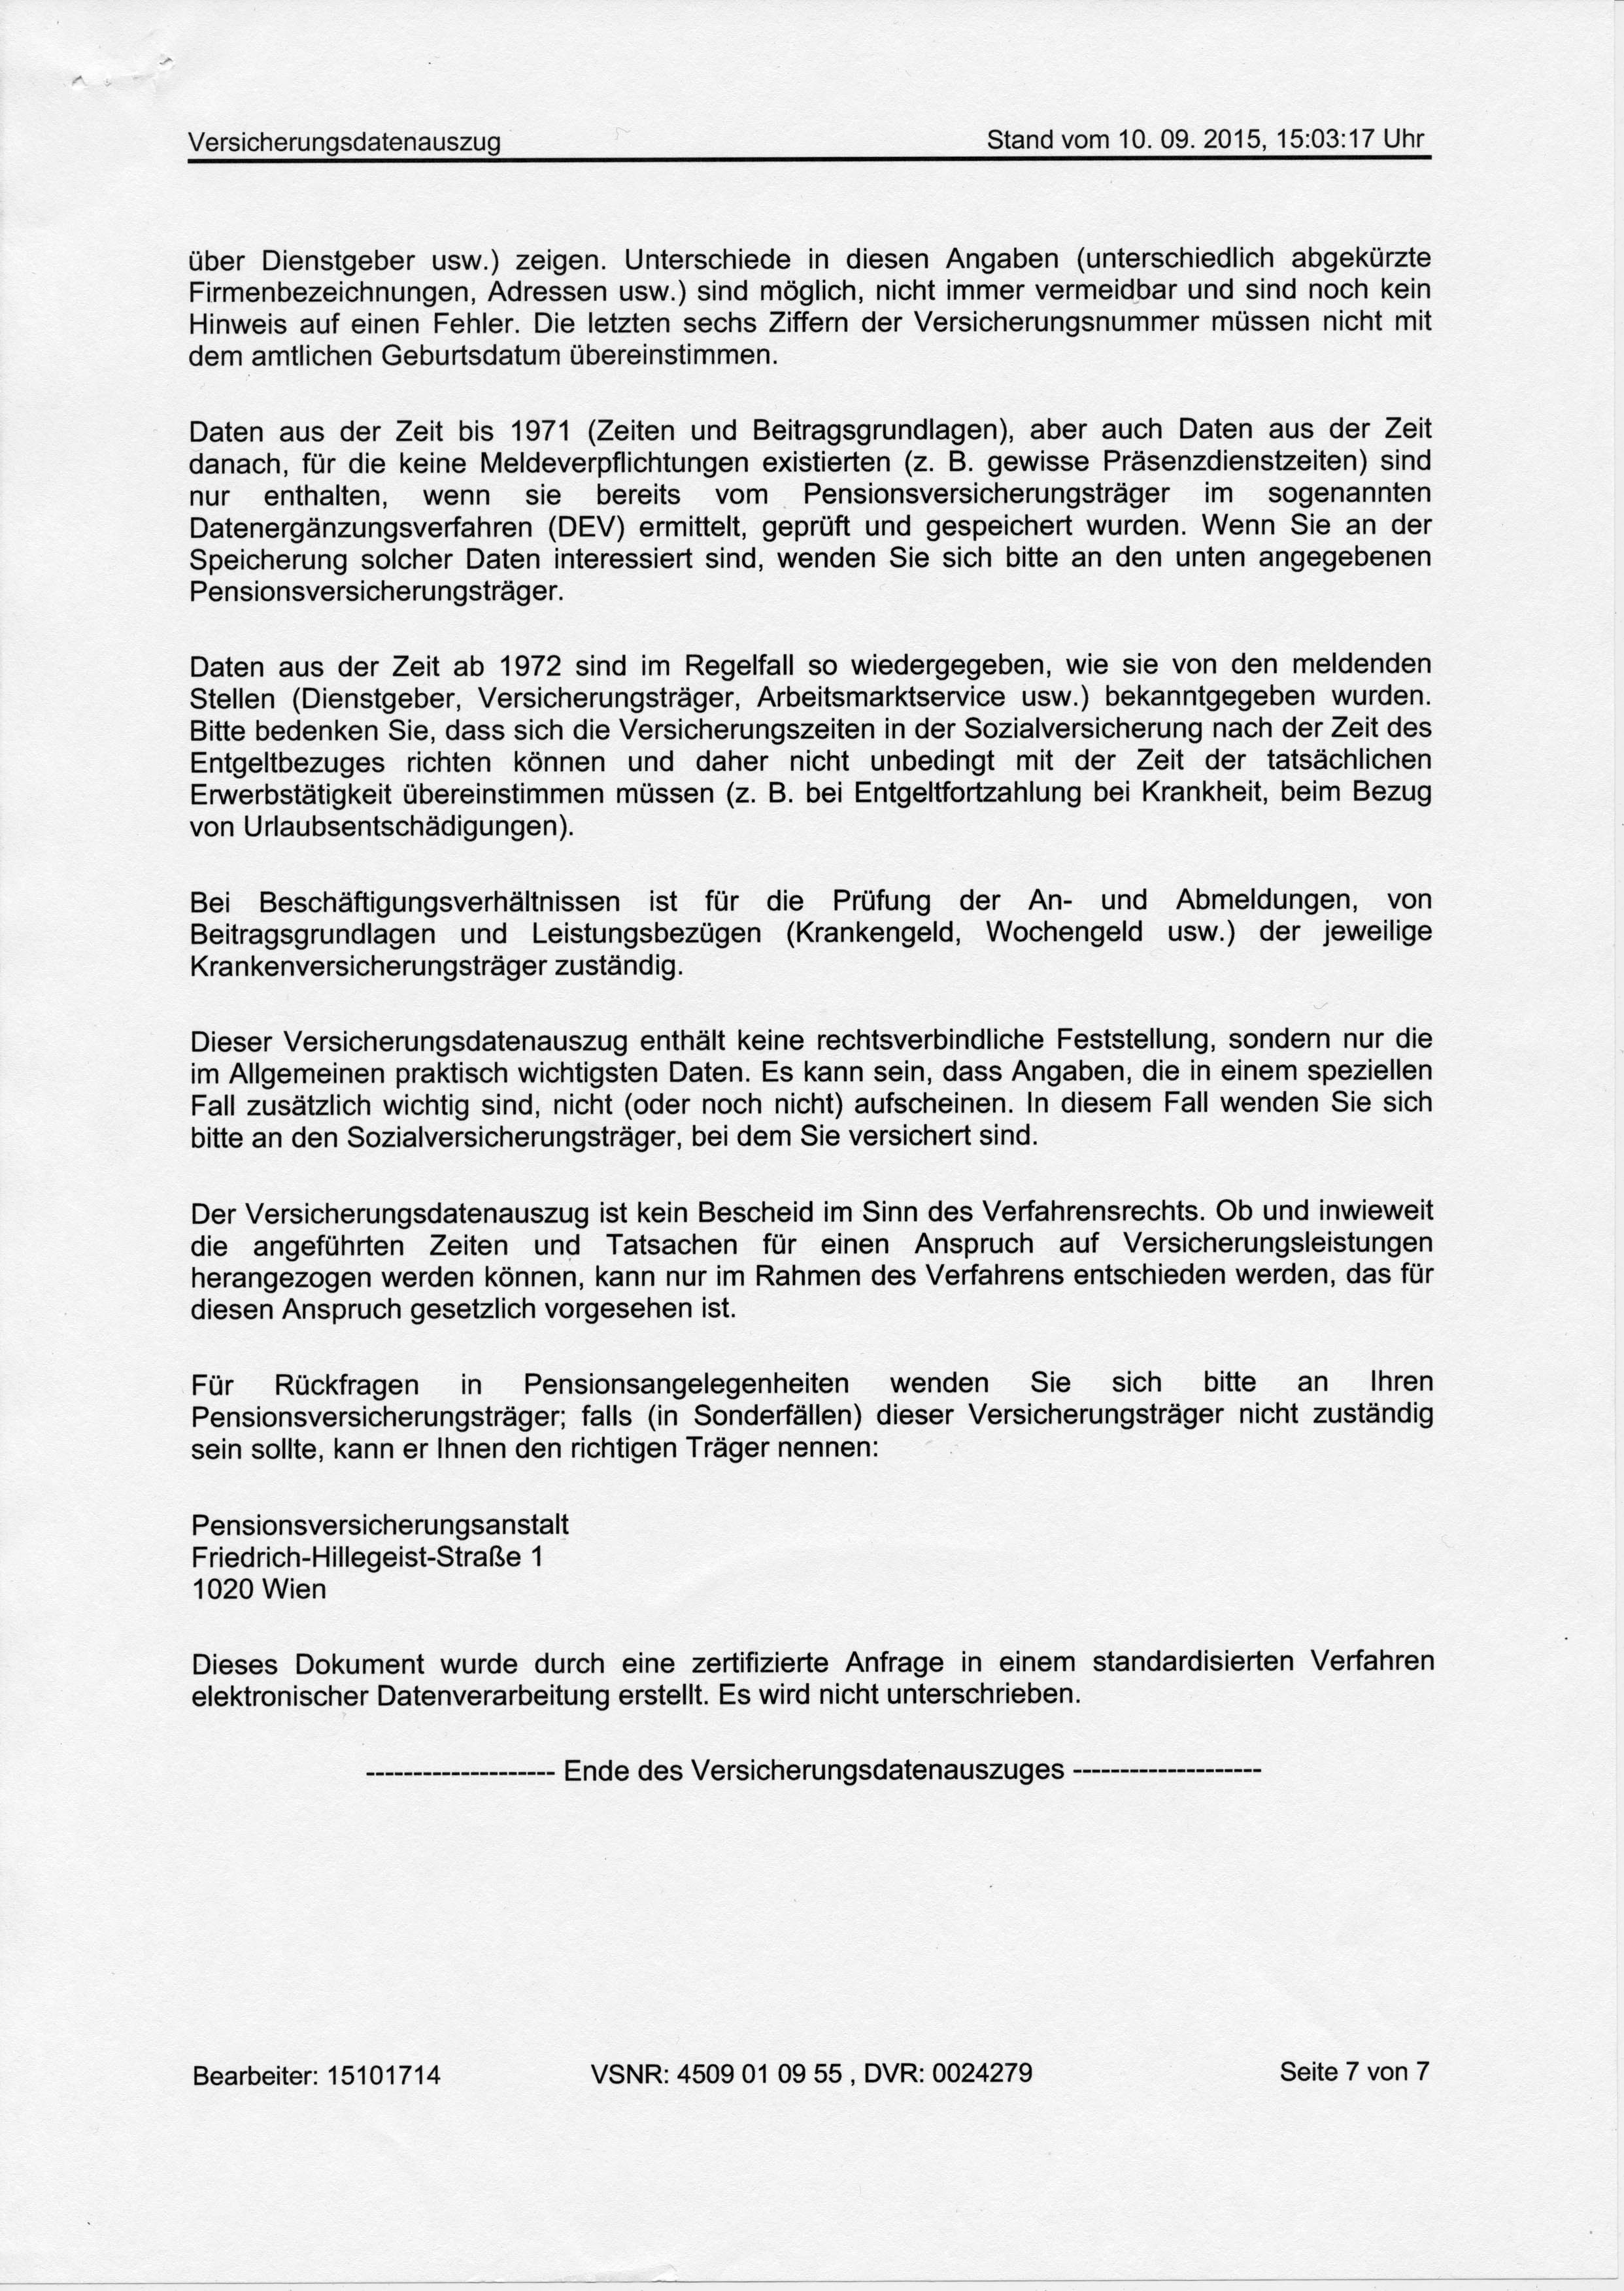 SVA-Präsident Mag. Peter McDonald – Offene Bitte um Überprüfung ...